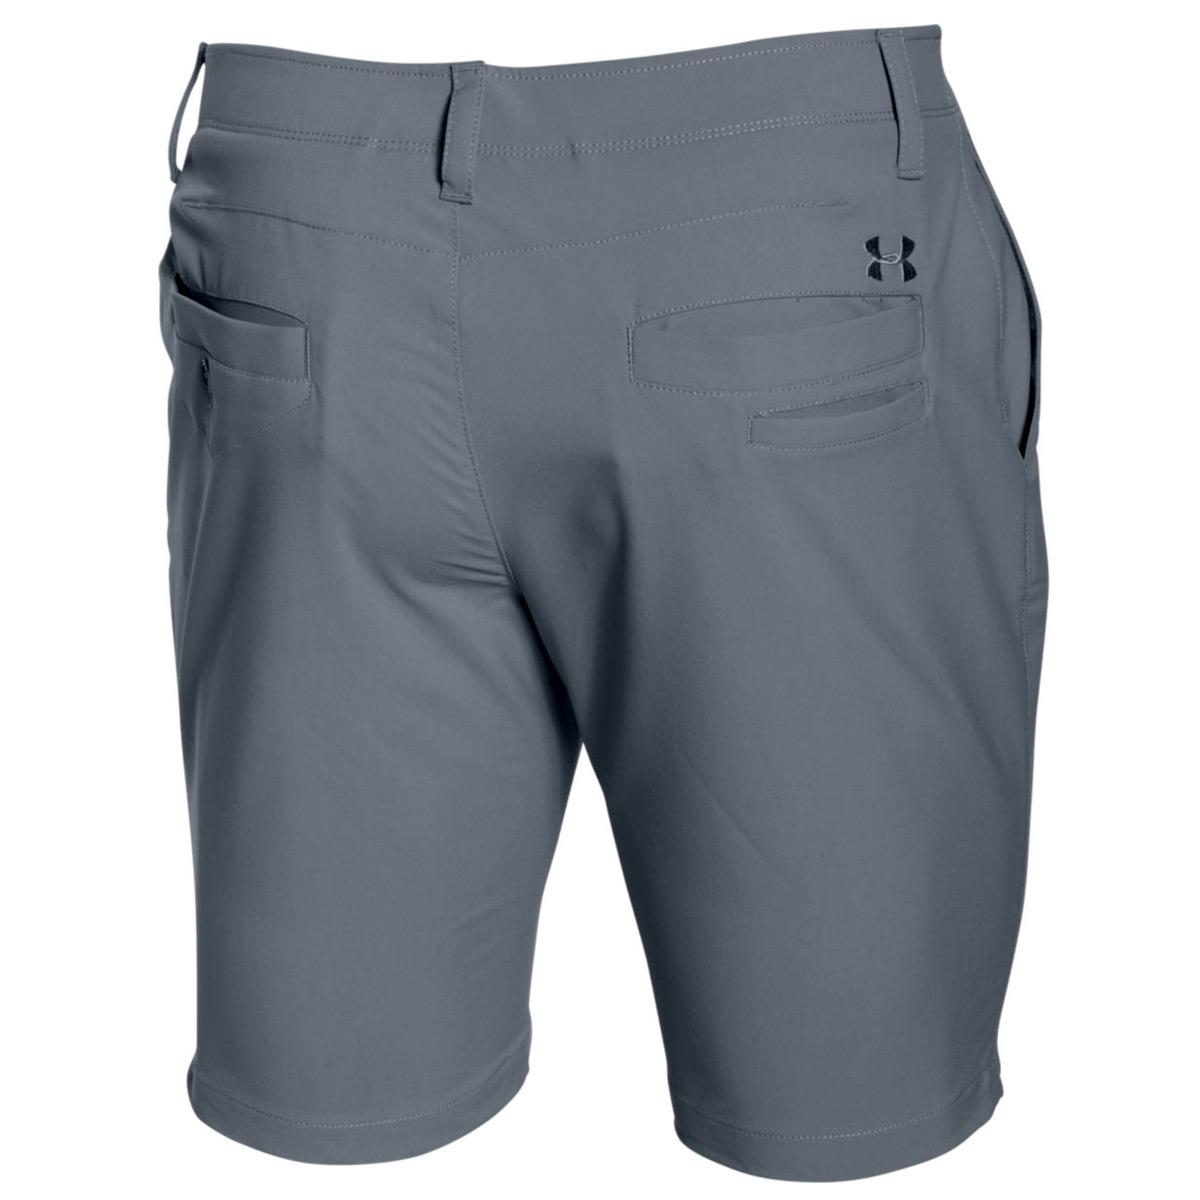 Under-Armour-Mens-UA-Match-Play-Taper-Tech-Performance-Summer-Golf-Shorts thumbnail 27